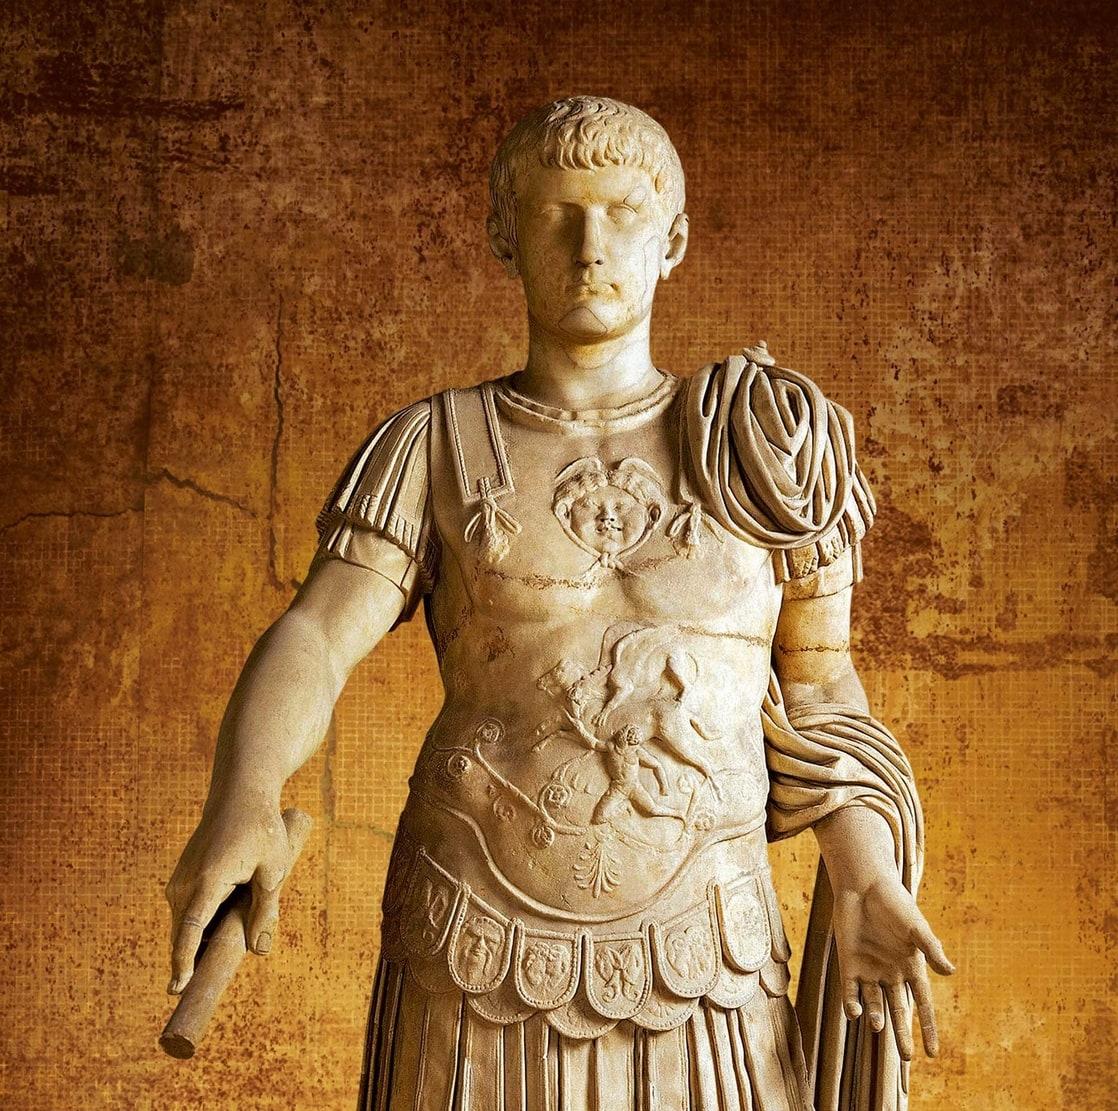 Gaius Caligula